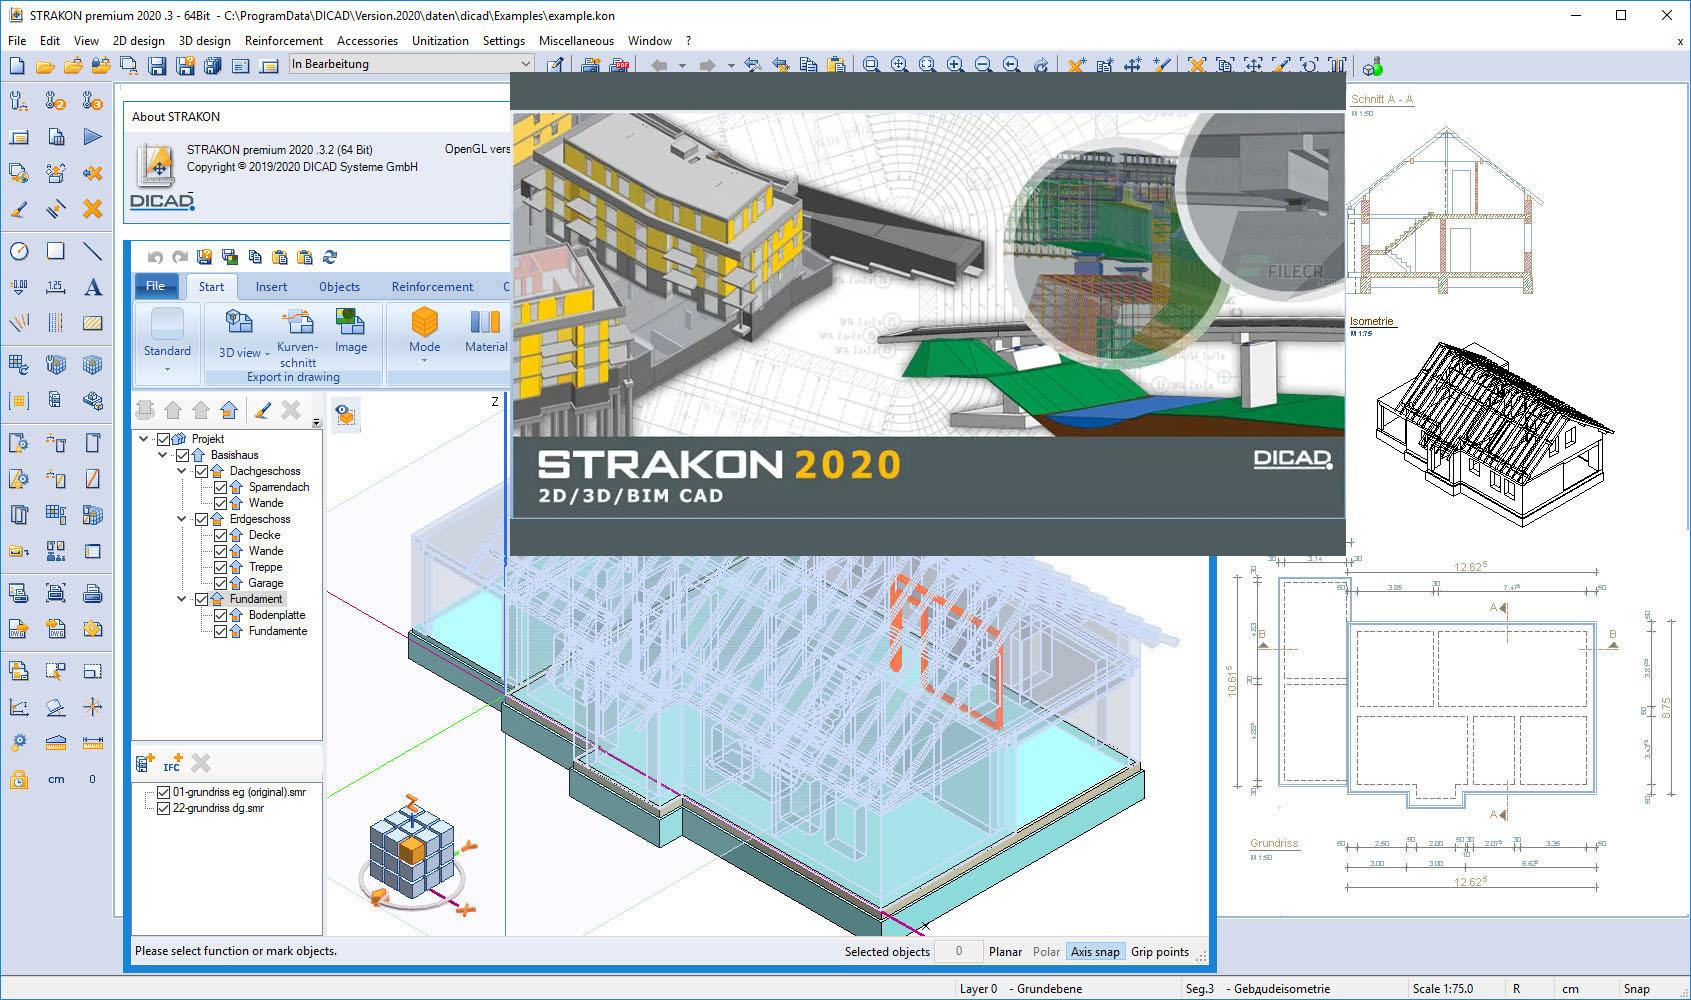 Working with DICAD STRAKON Premium 2020.3.2 full license